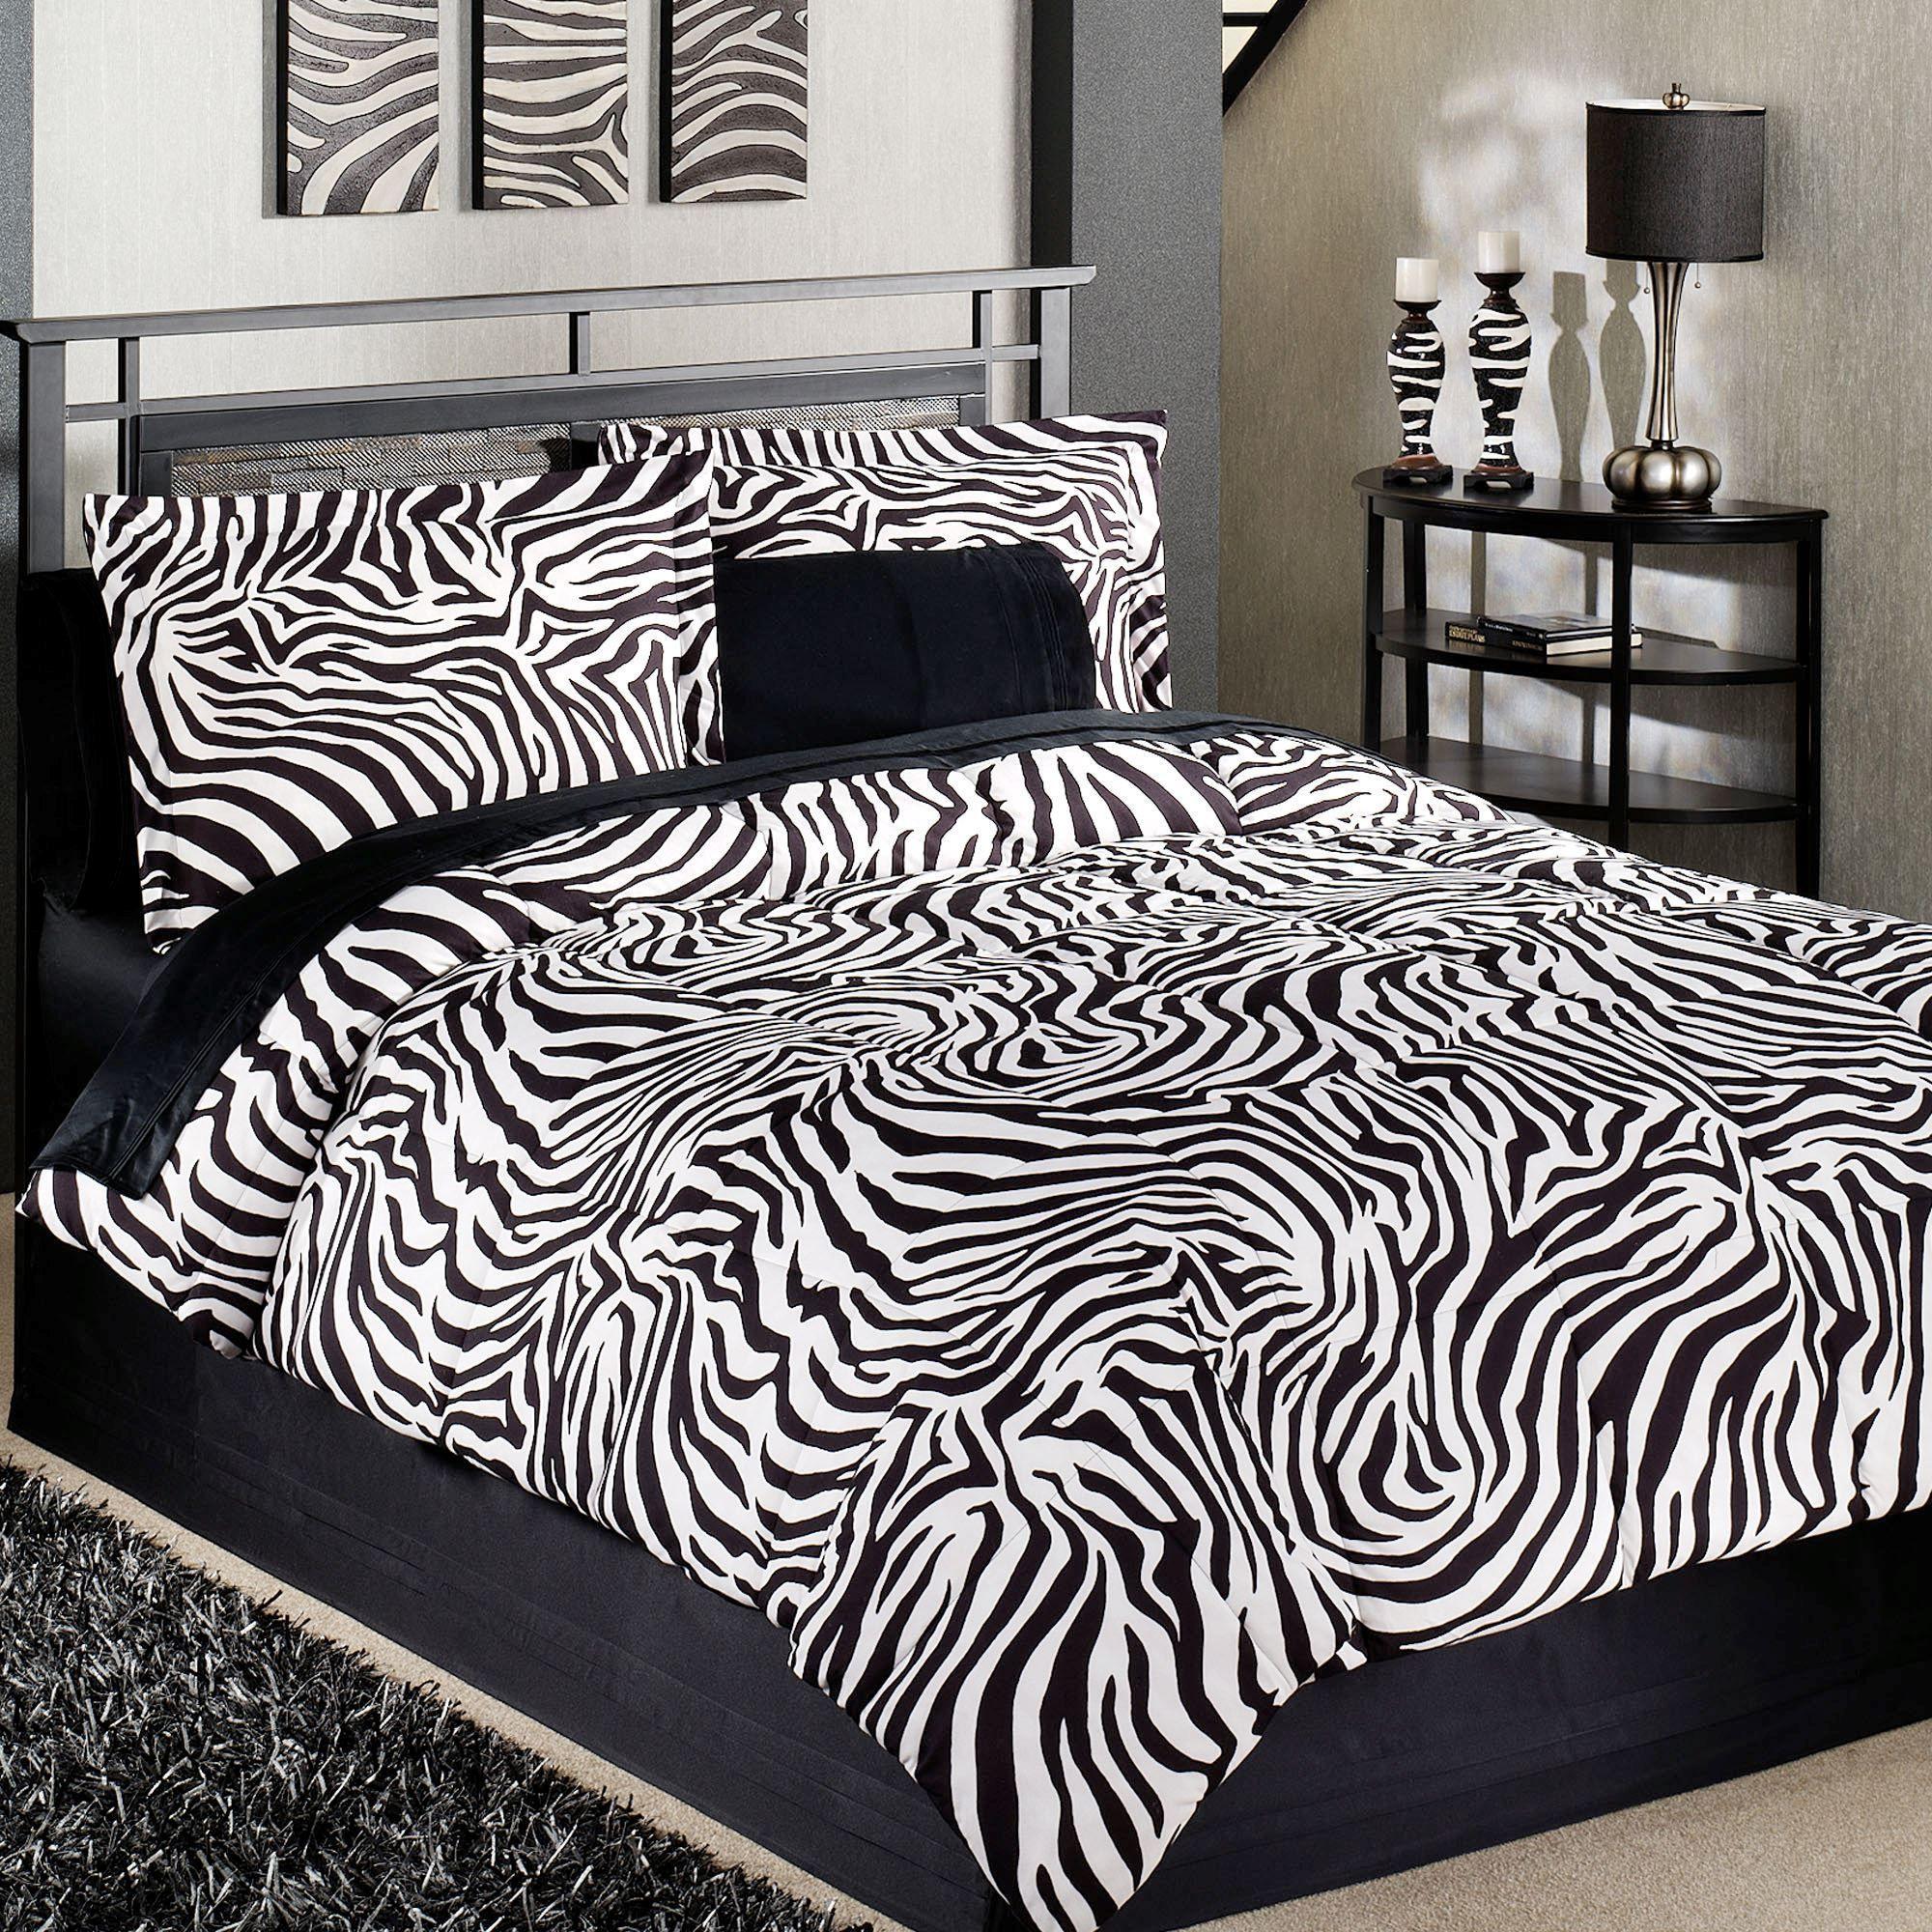 zebra bedroom ideas. cute zebra bedroom furniture theme decor,